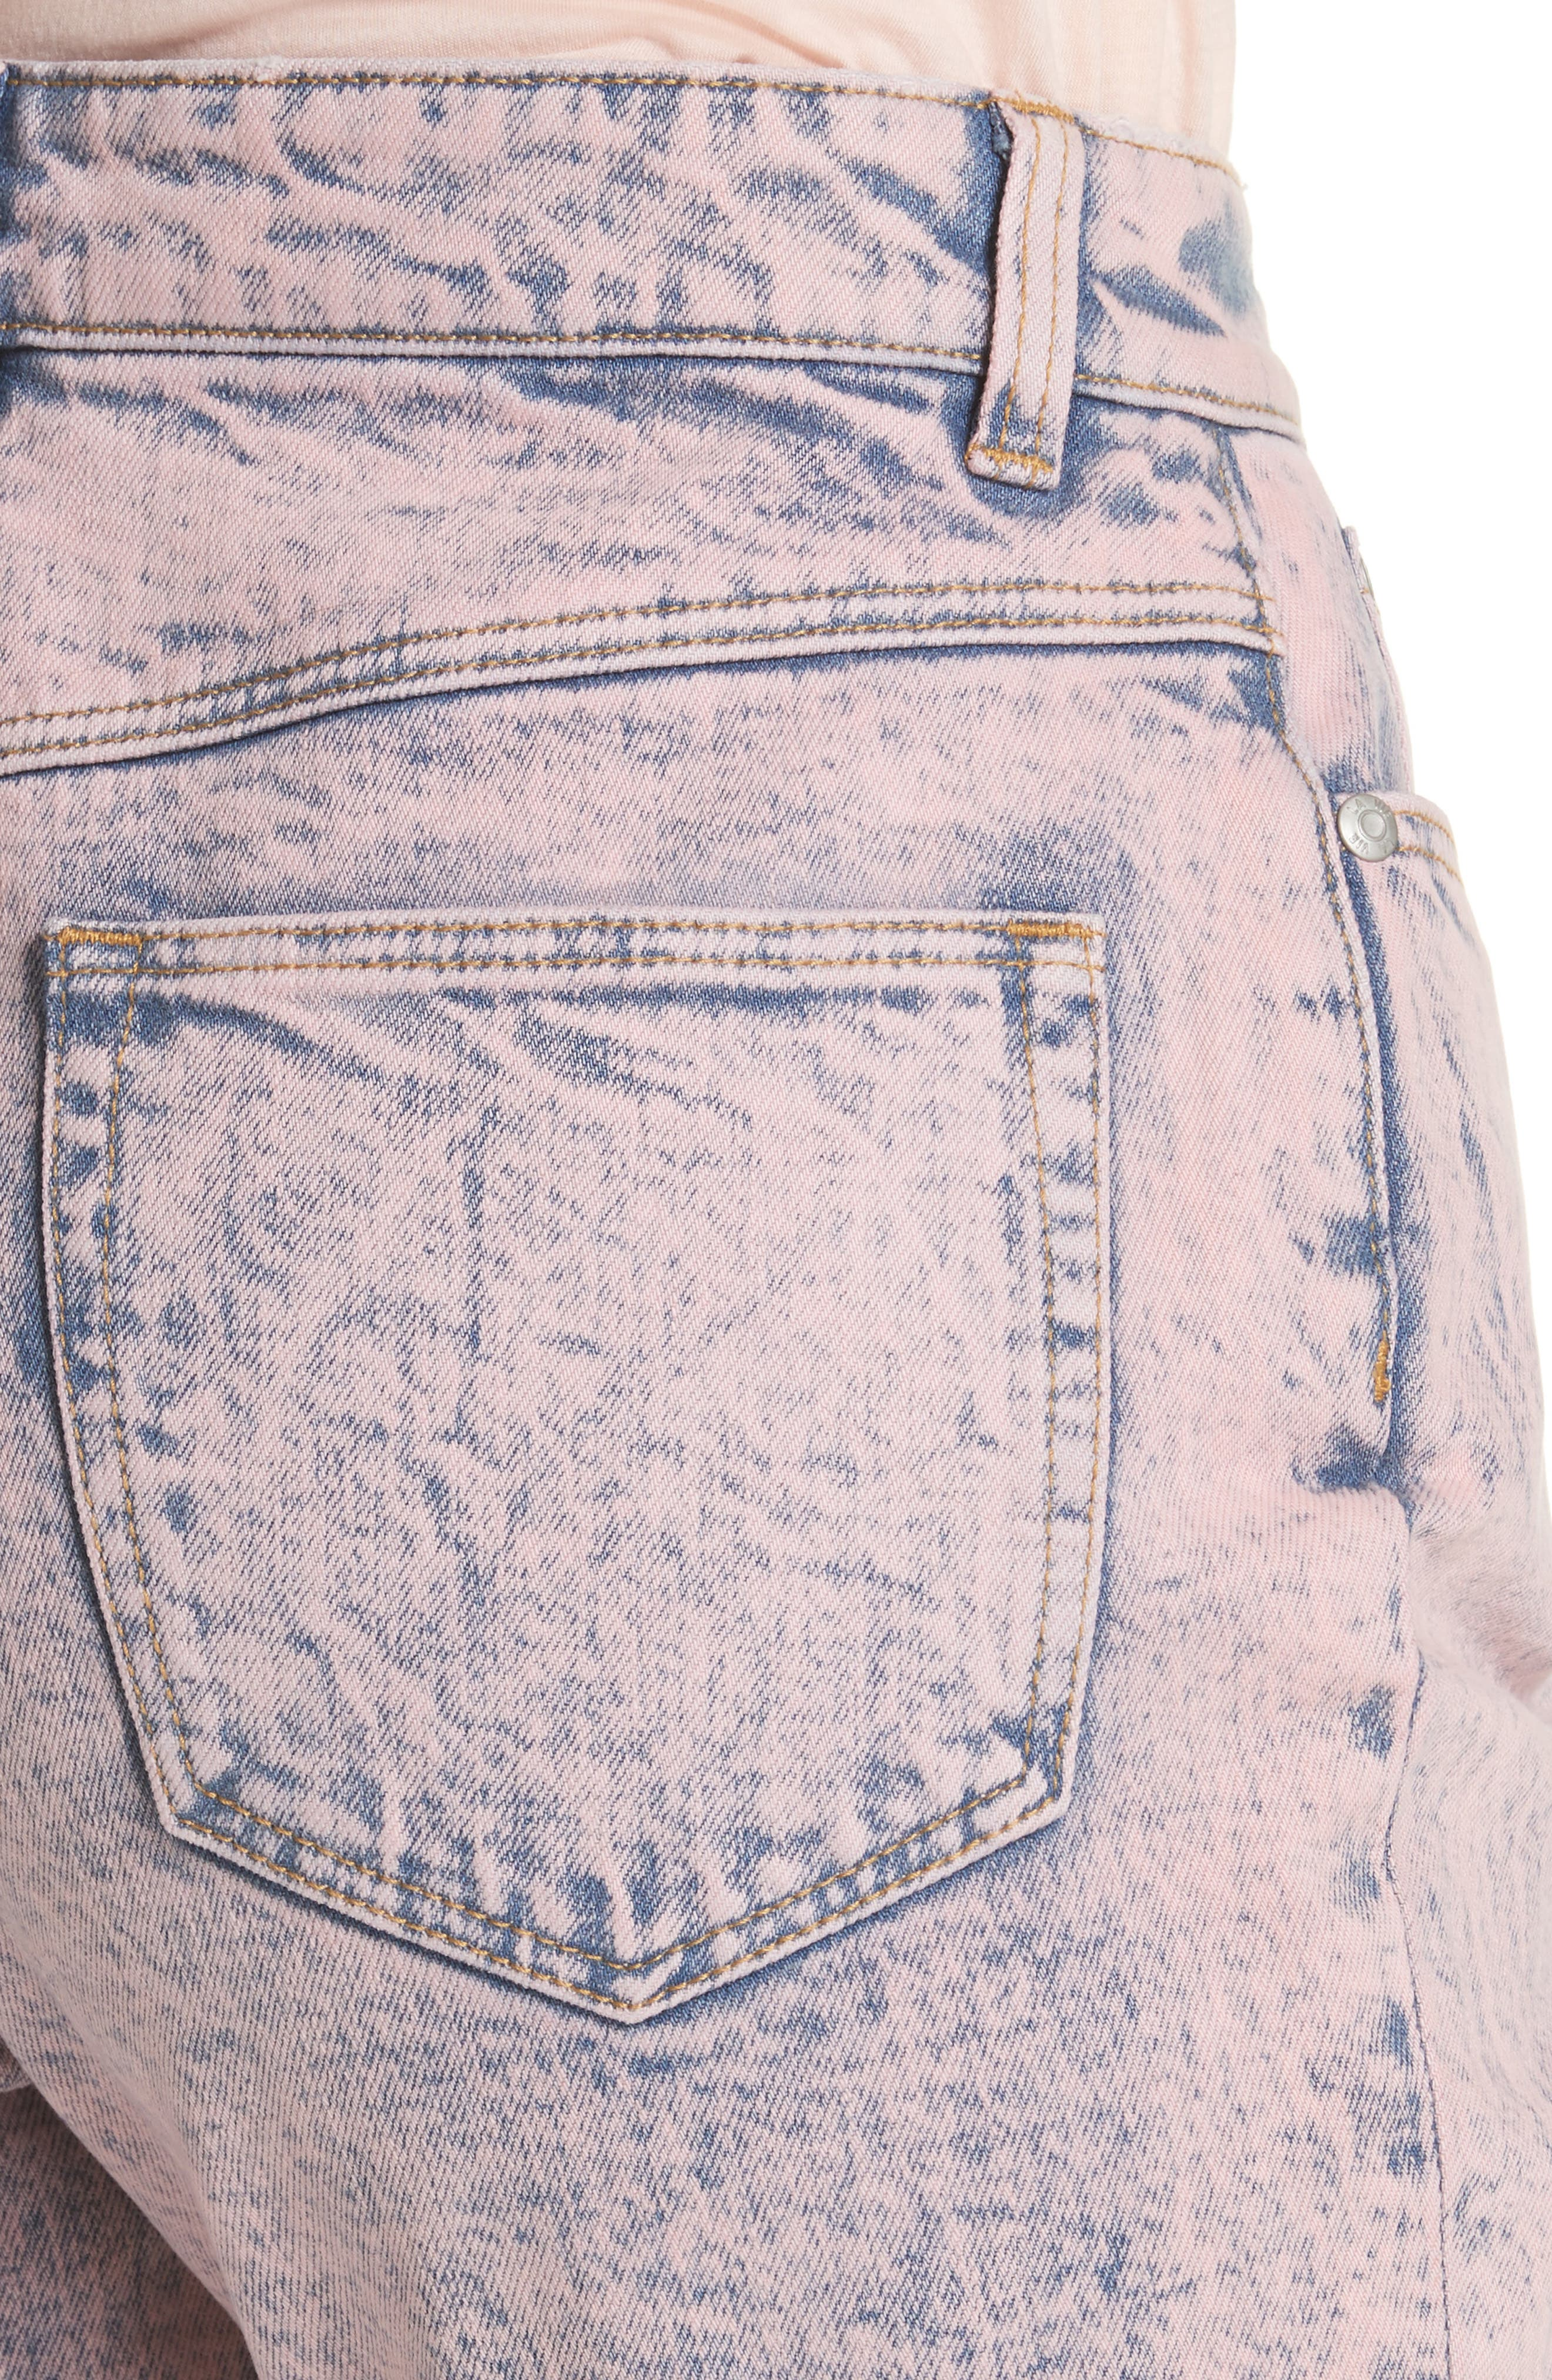 Ines Acid Wash Crop Jeans,                             Alternate thumbnail 4, color,                             658